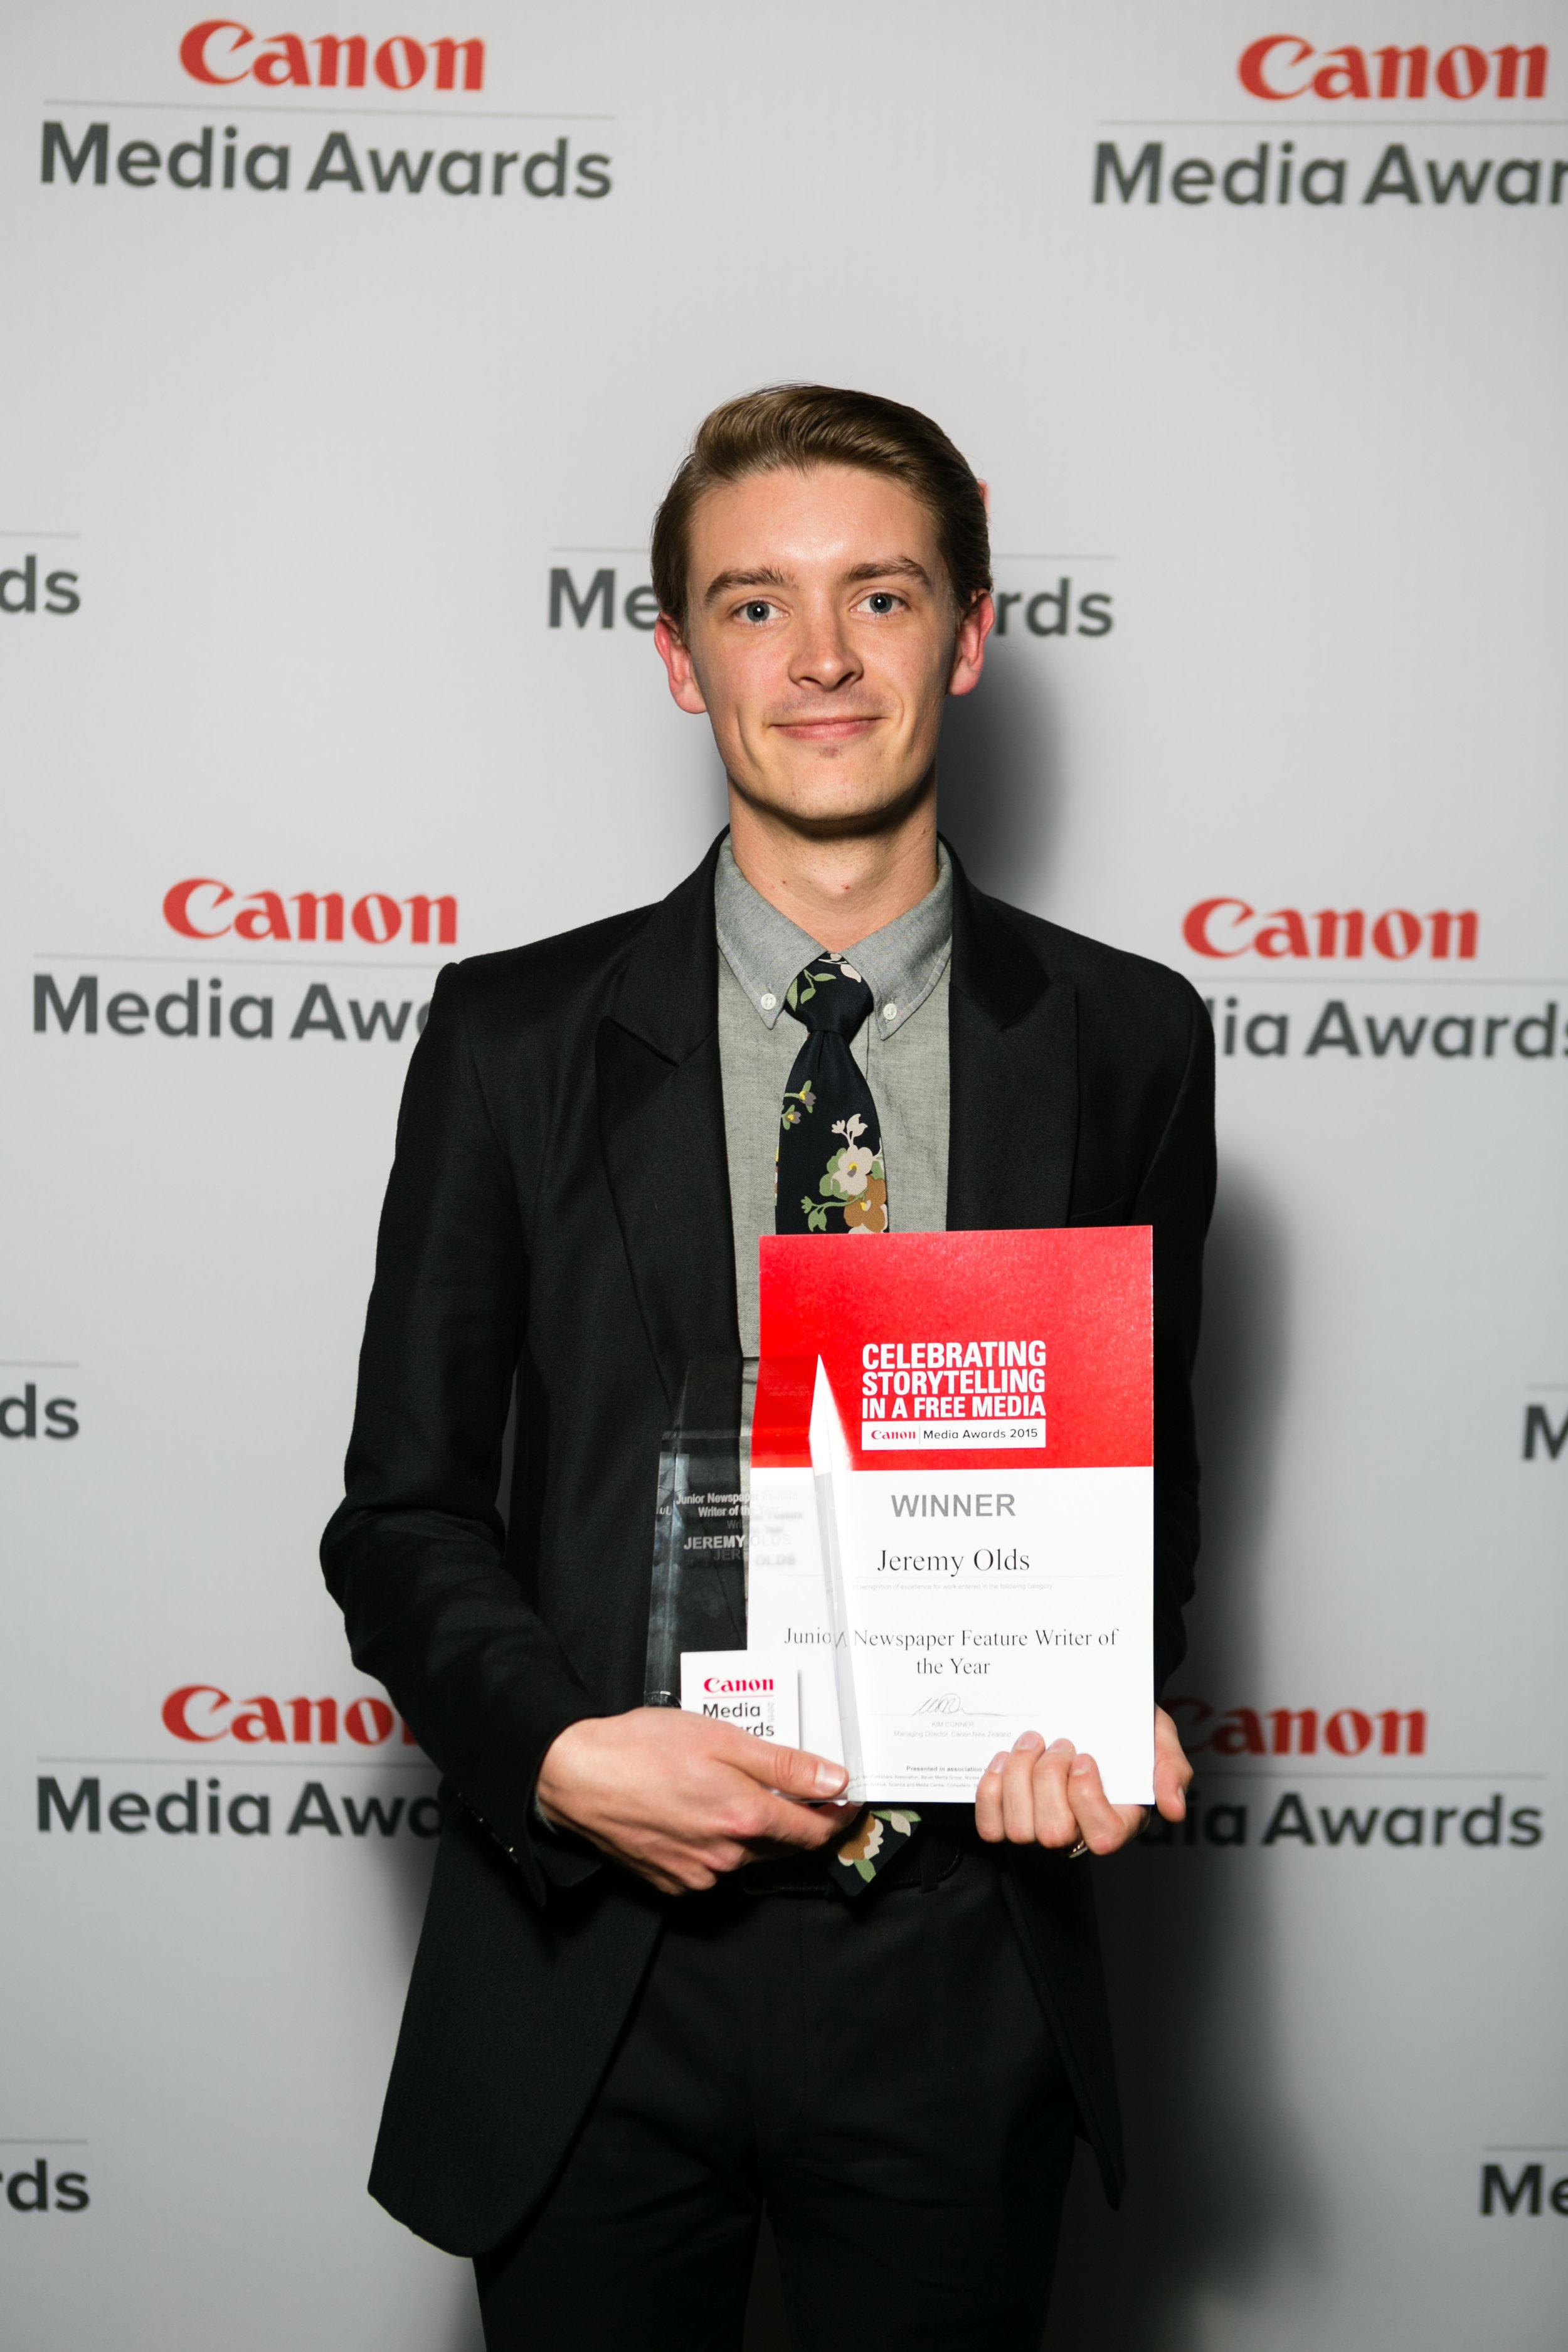 canon_media_awards_2015_interlike_nz_clinton_tudor-5908-180.jpg